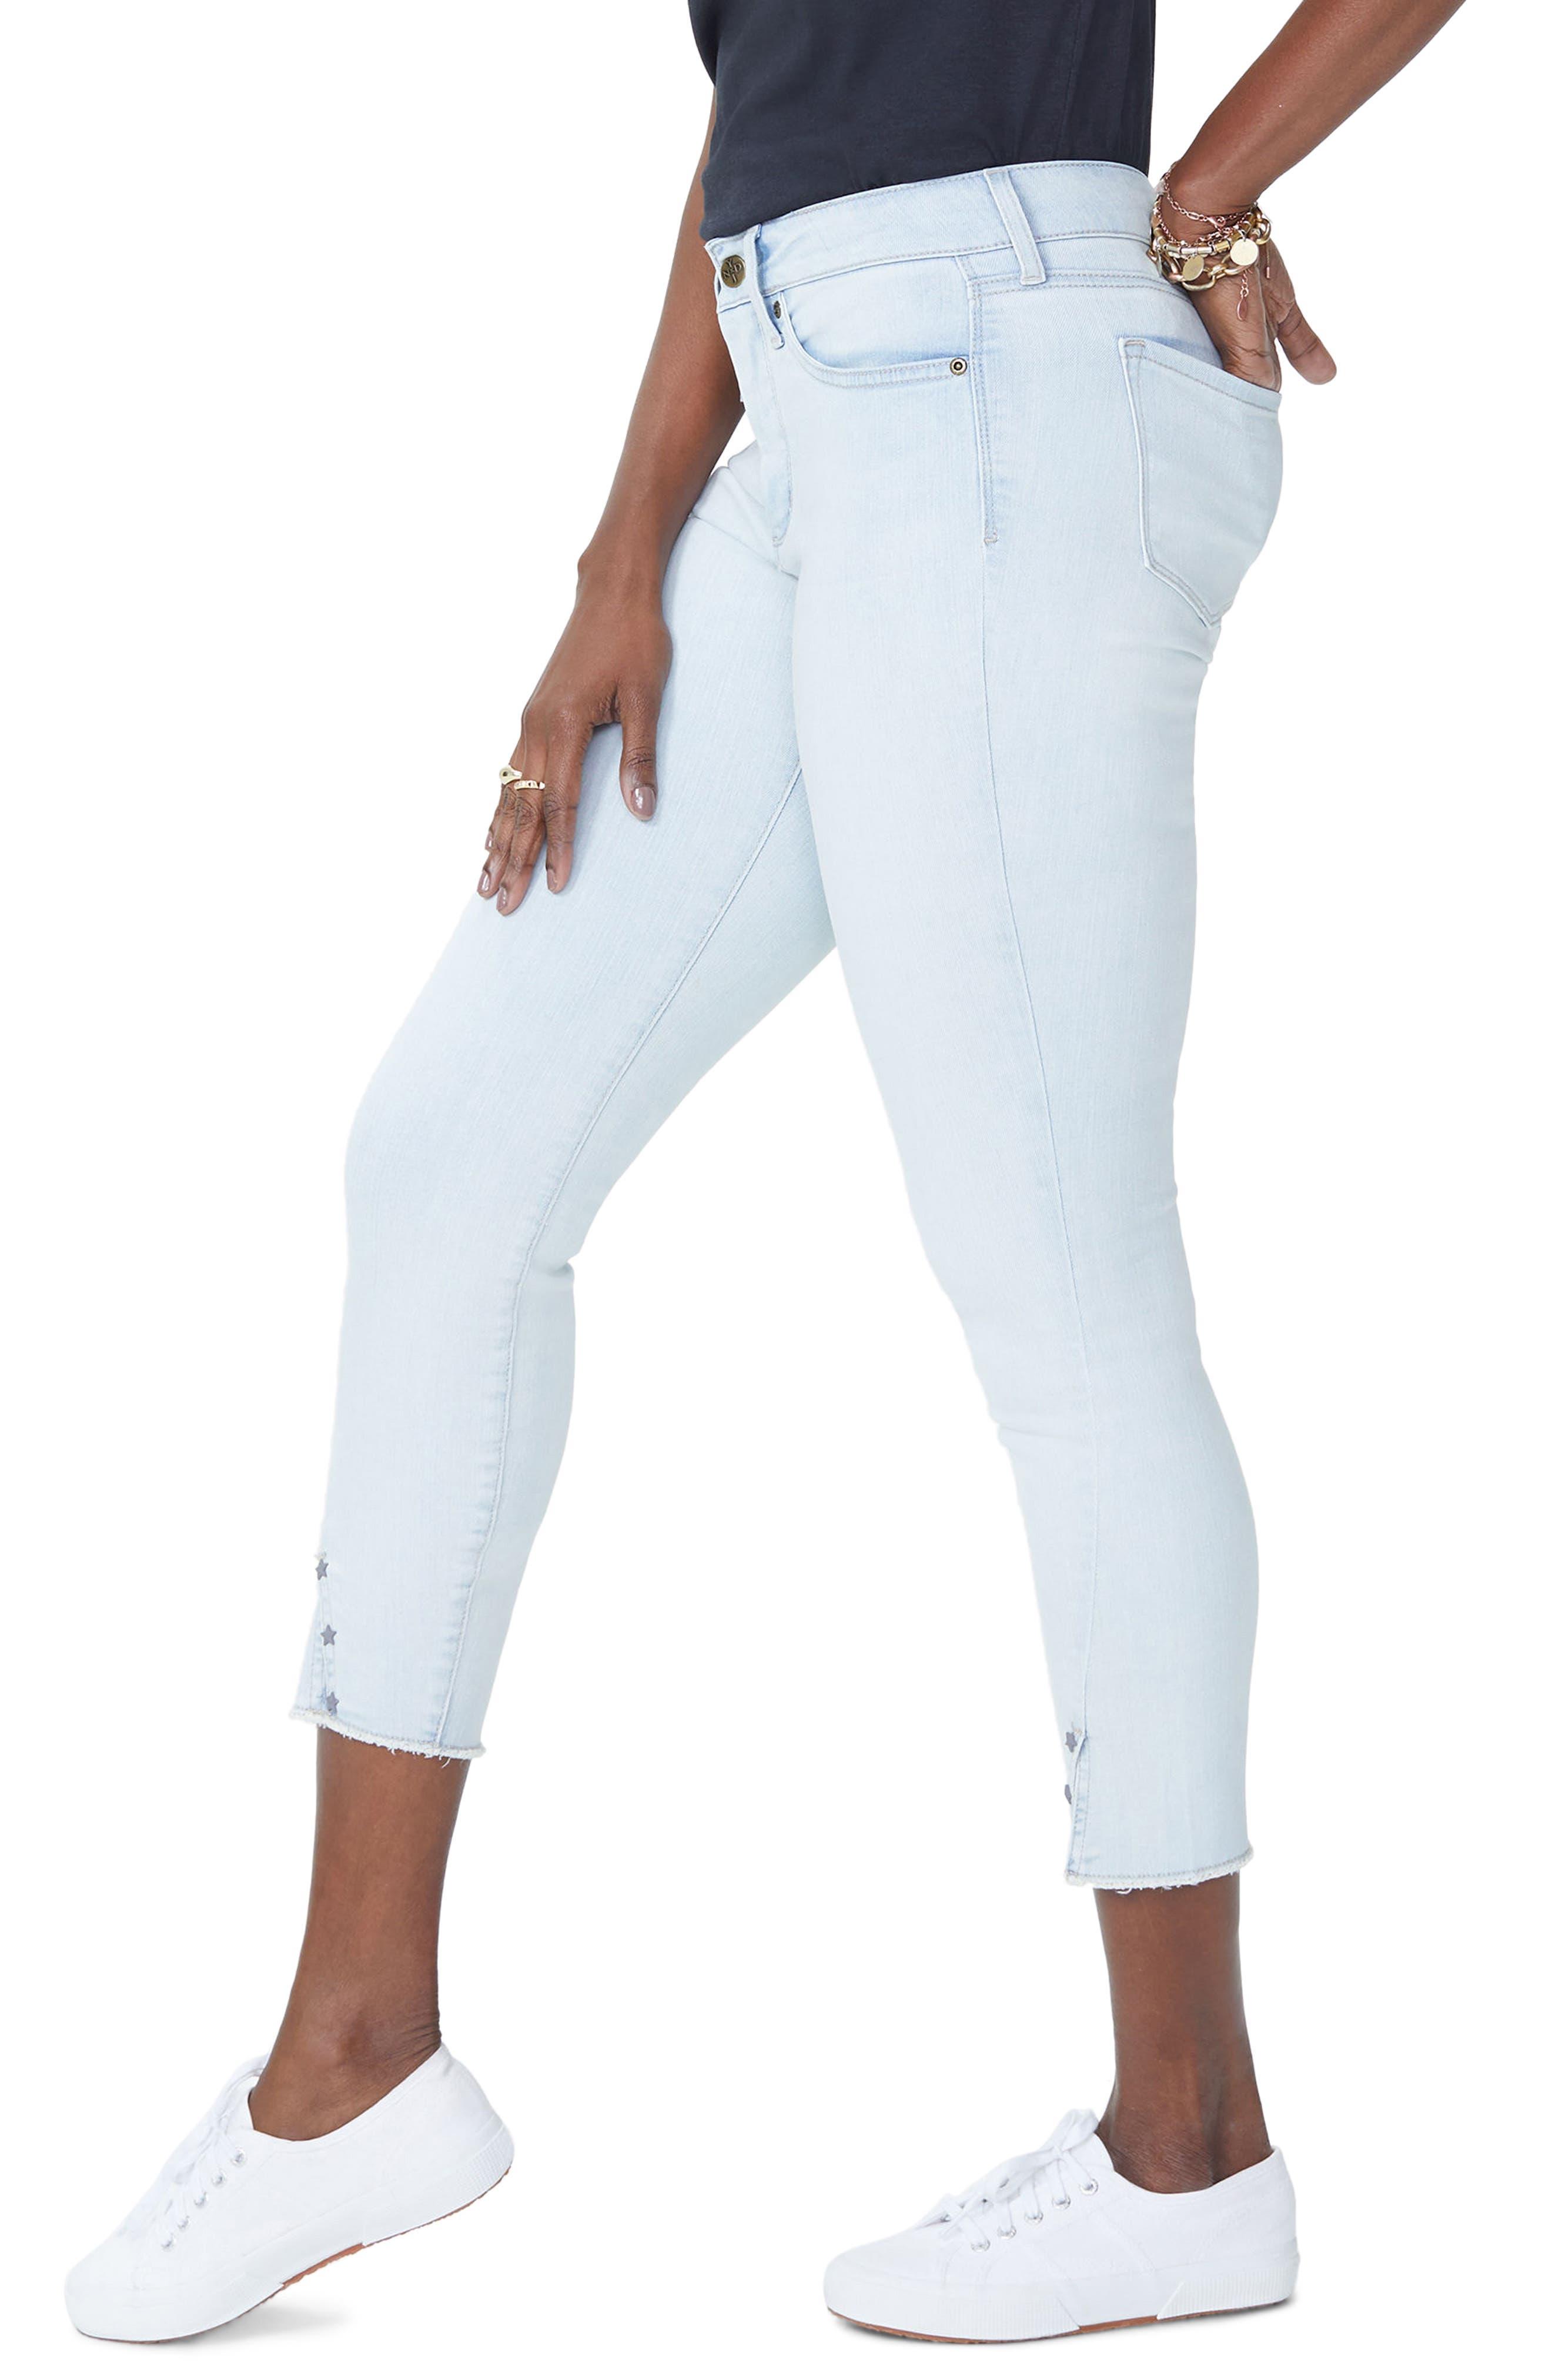 Ami Twist Seam Stretch Ankle Skinny Jeans,                             Alternate thumbnail 3, color,                             Palm Desert